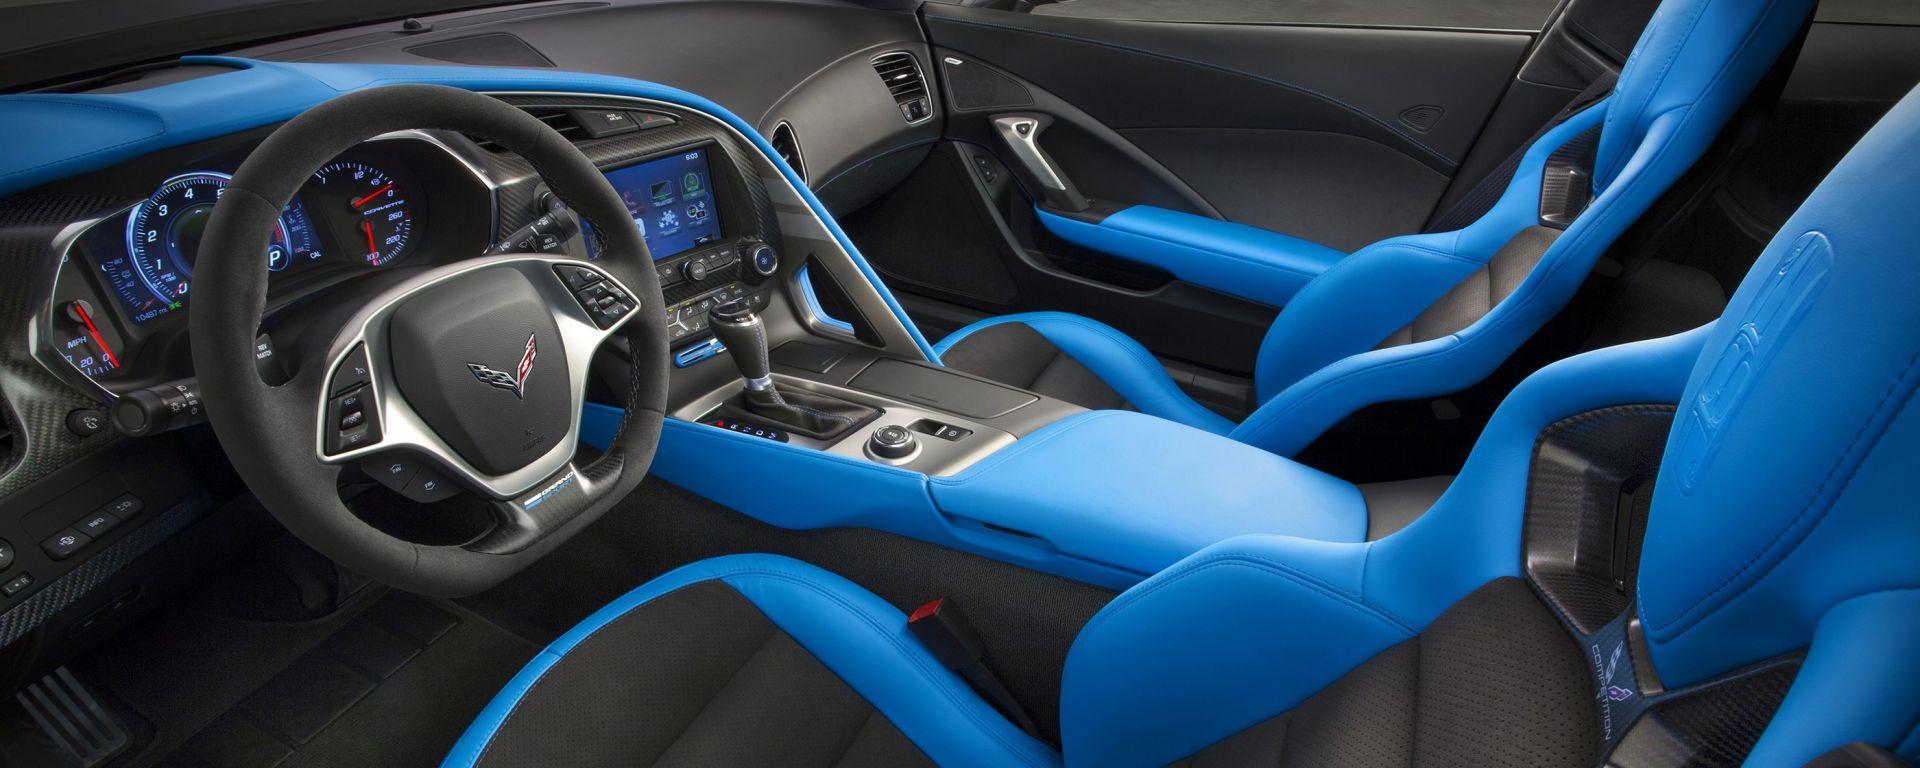 Corvette Grand Sport 2017